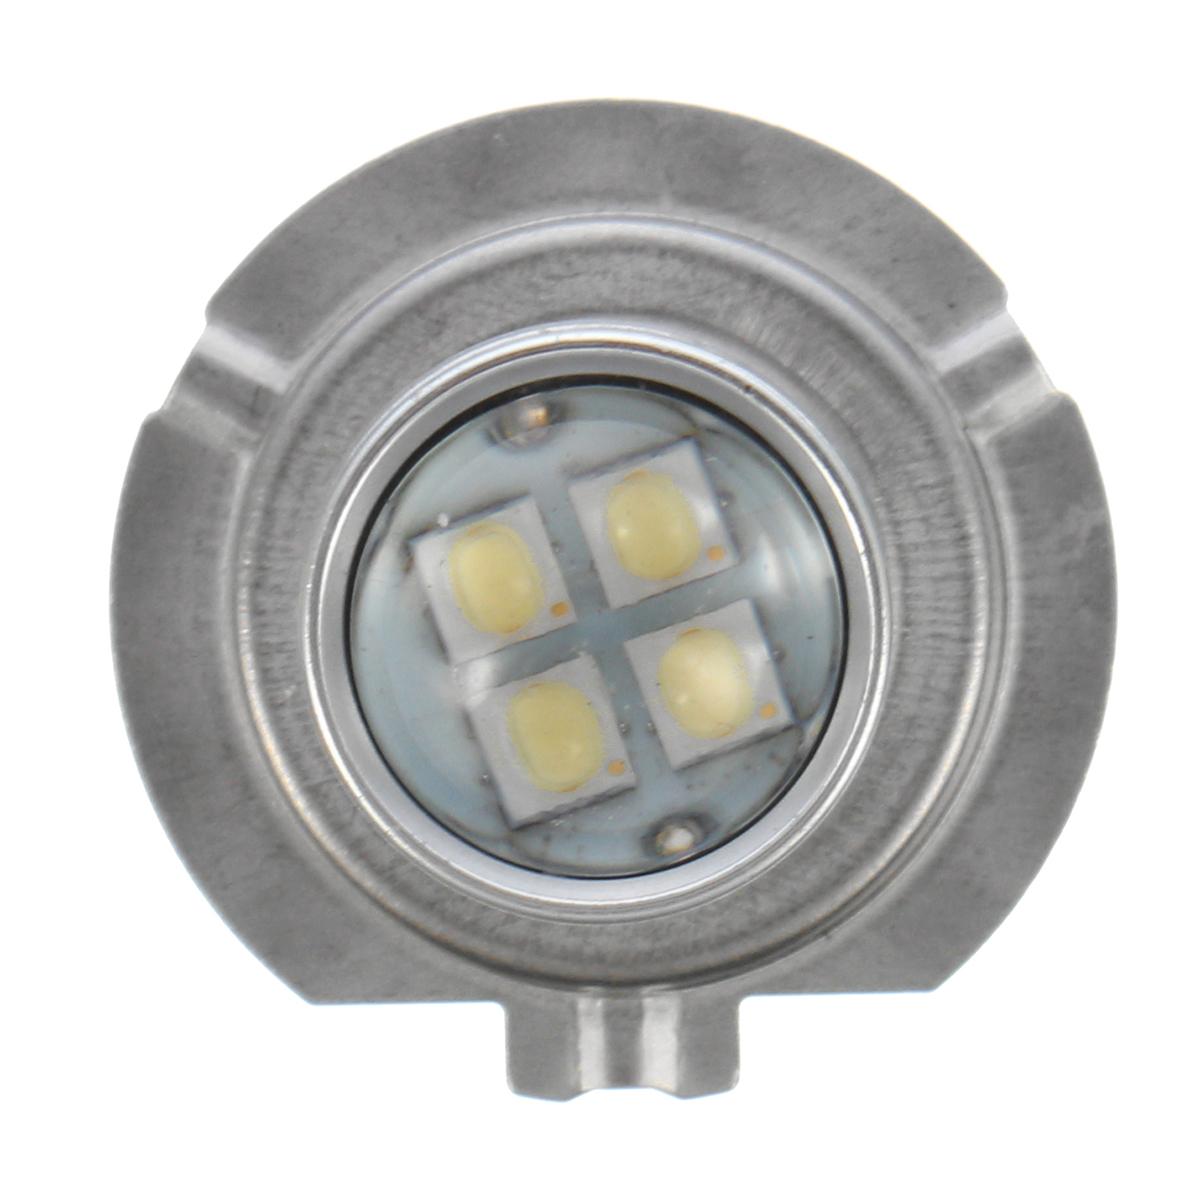 2X 100W 12-24V H7 LED Фары Противотуманные хвостовые ксеноновые лампы - фото 5